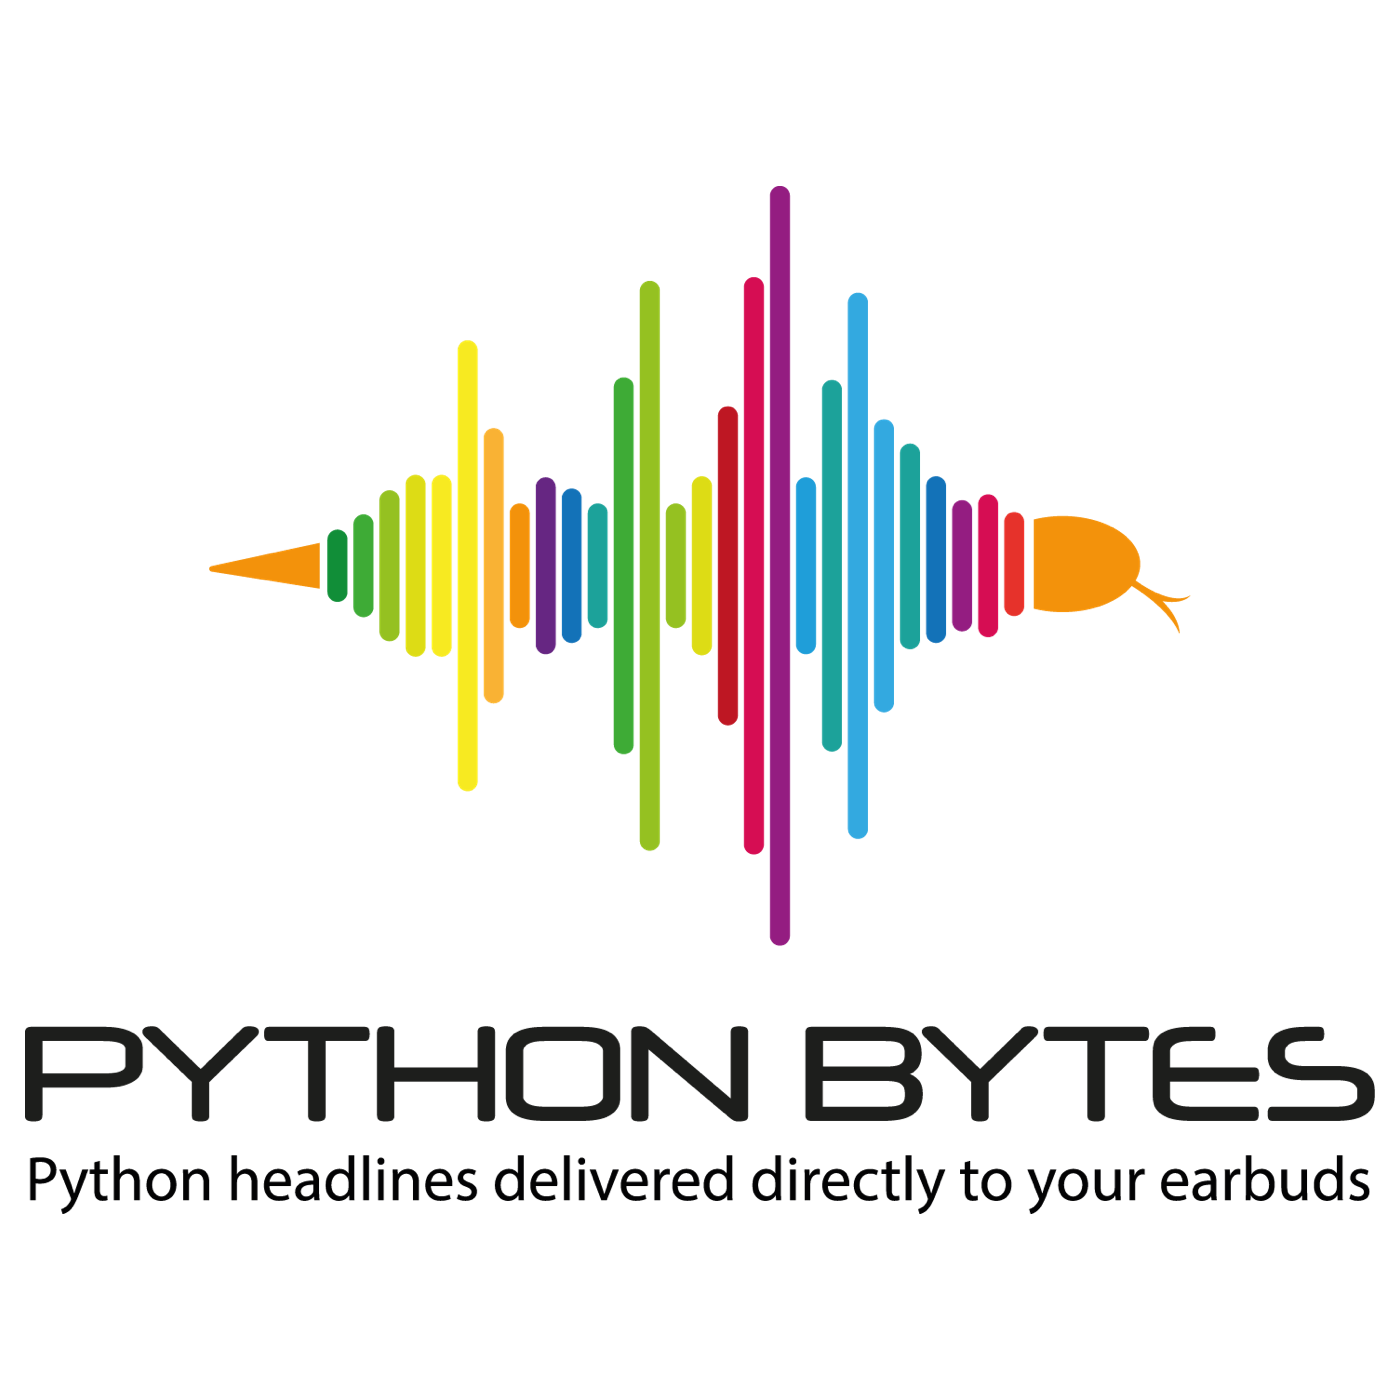 138 Will PyOxidizer weld shut one of Python's major gaps